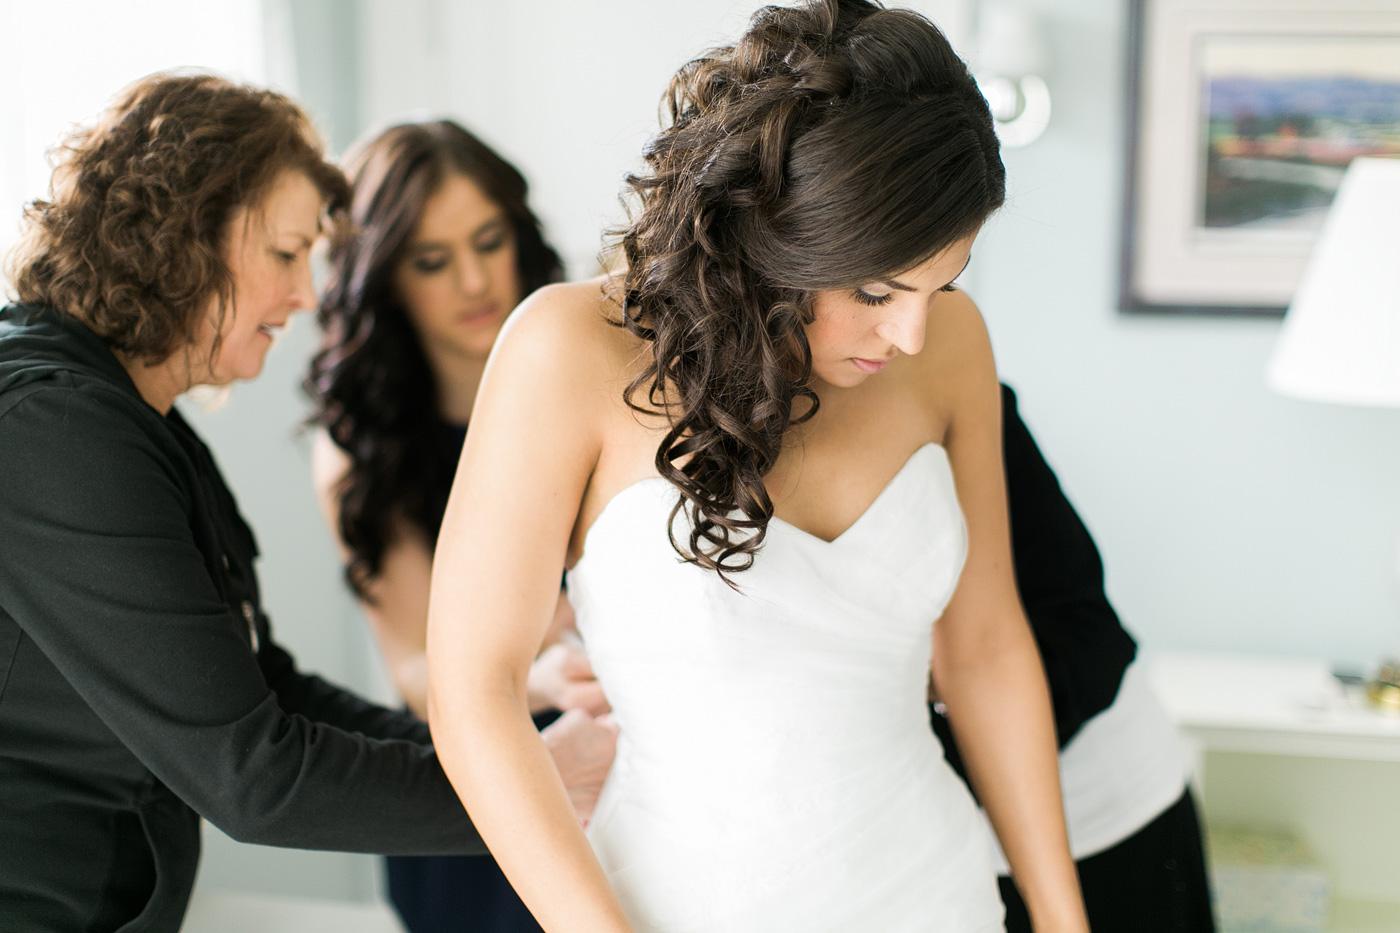 seattle-wedding-photographer-06